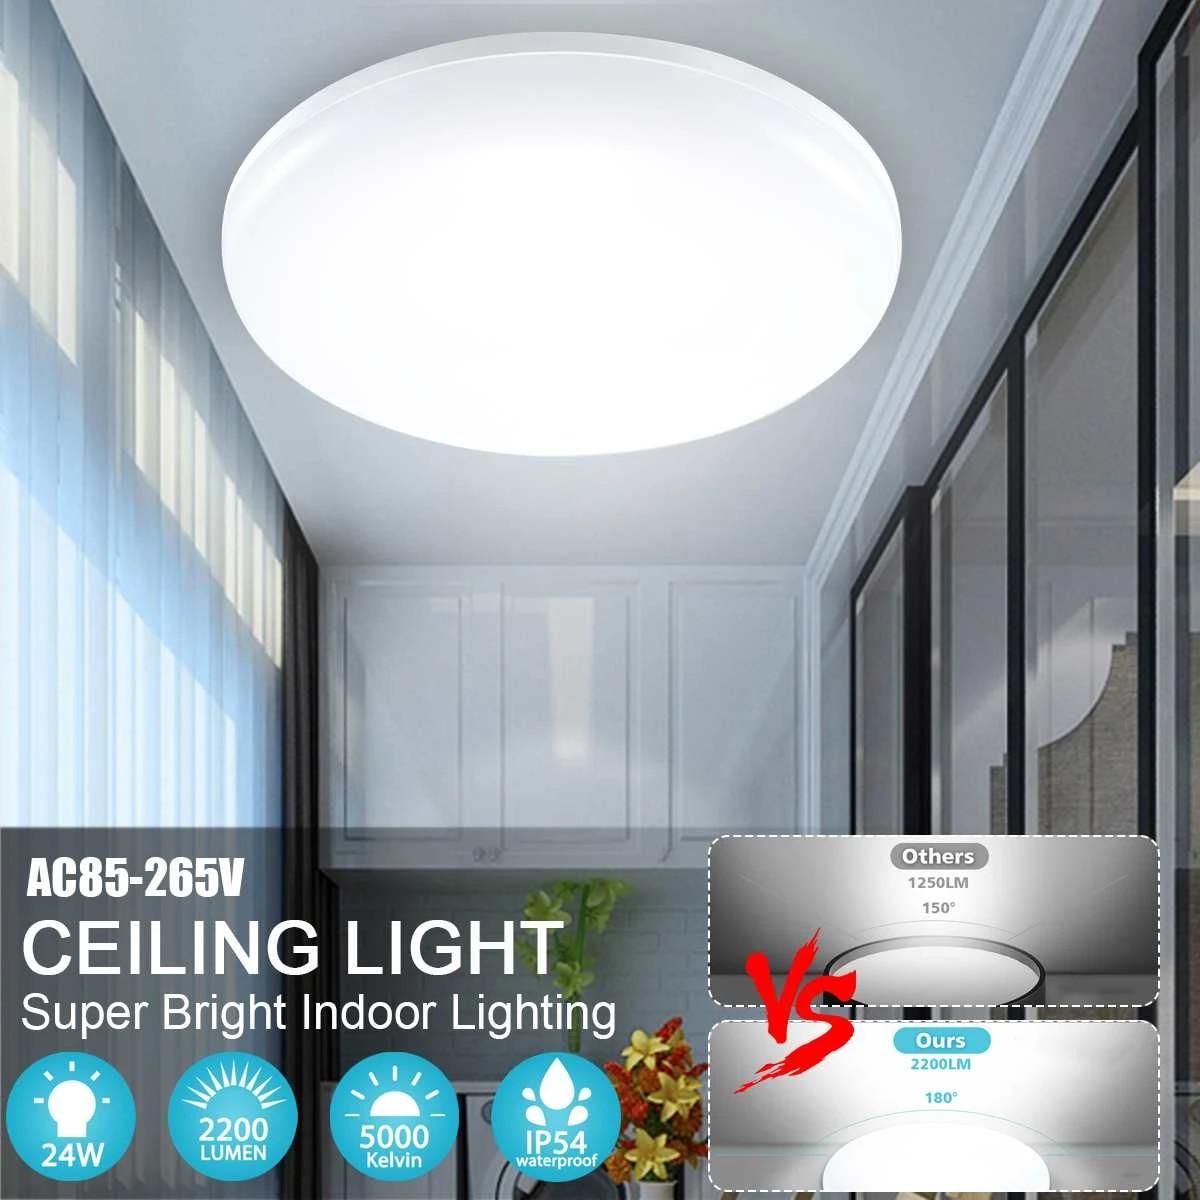 LED Ceiling Light 24W 2200LM 23CM Round Panel Light Fixture Chandelier Home Room Decor For Bathroom Kitchen Living Room Lighting